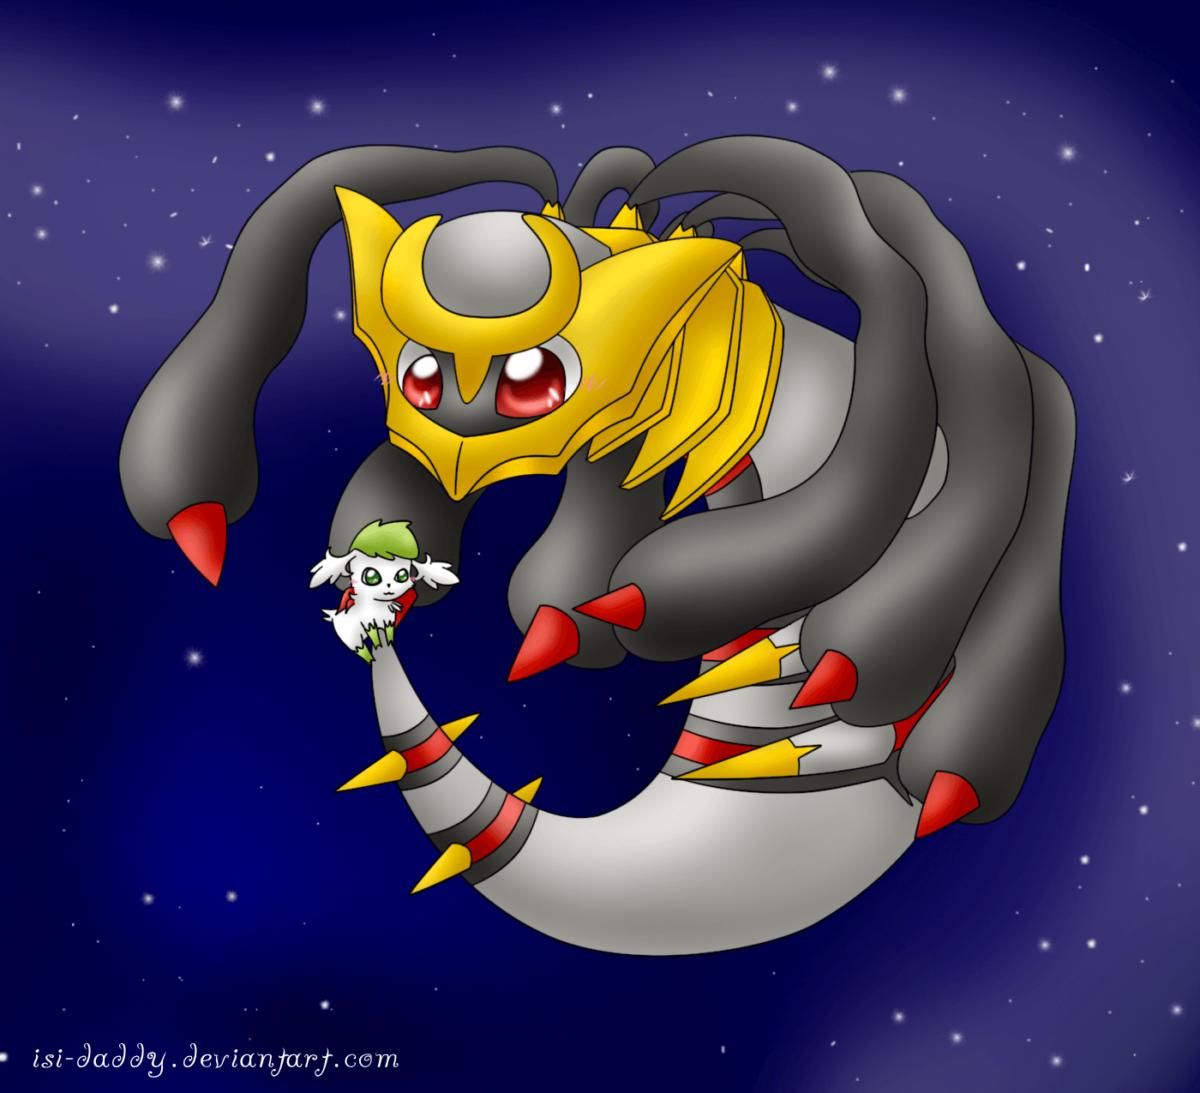 Pokemon Couples!! images Giratina and Shaymin HD wallpaper and …